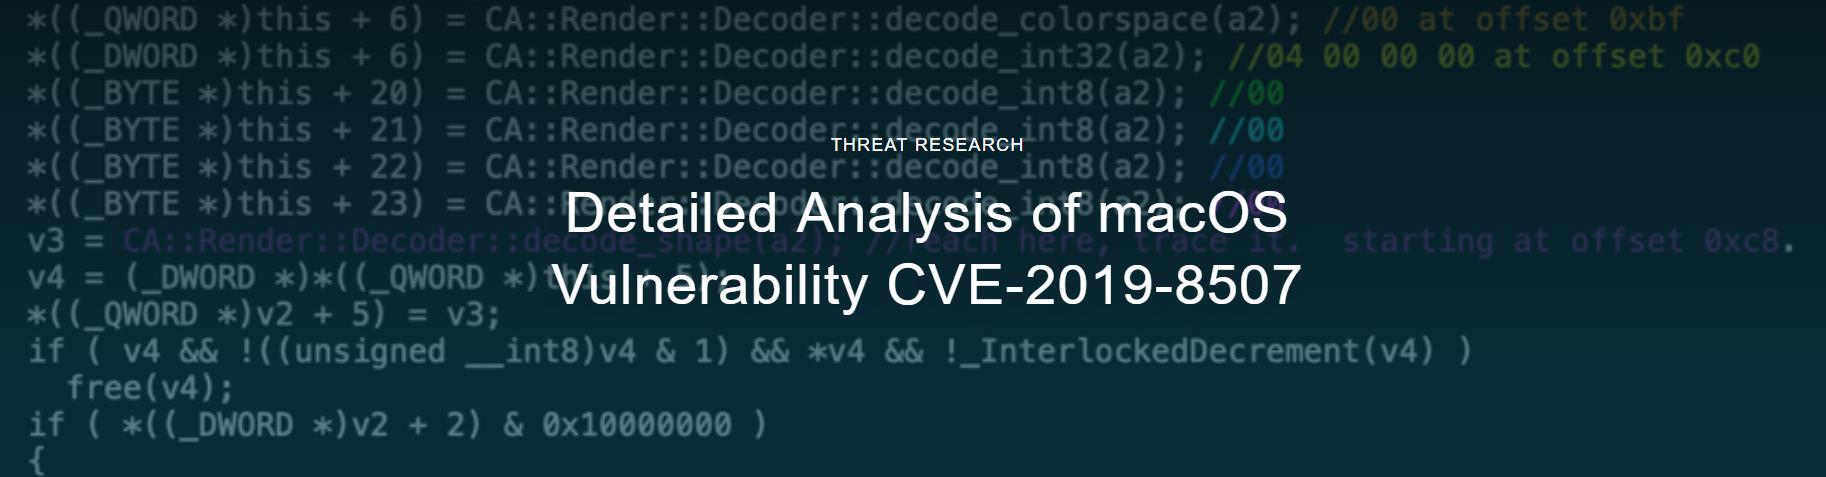 分析macOS漏洞CVE-2019-8507